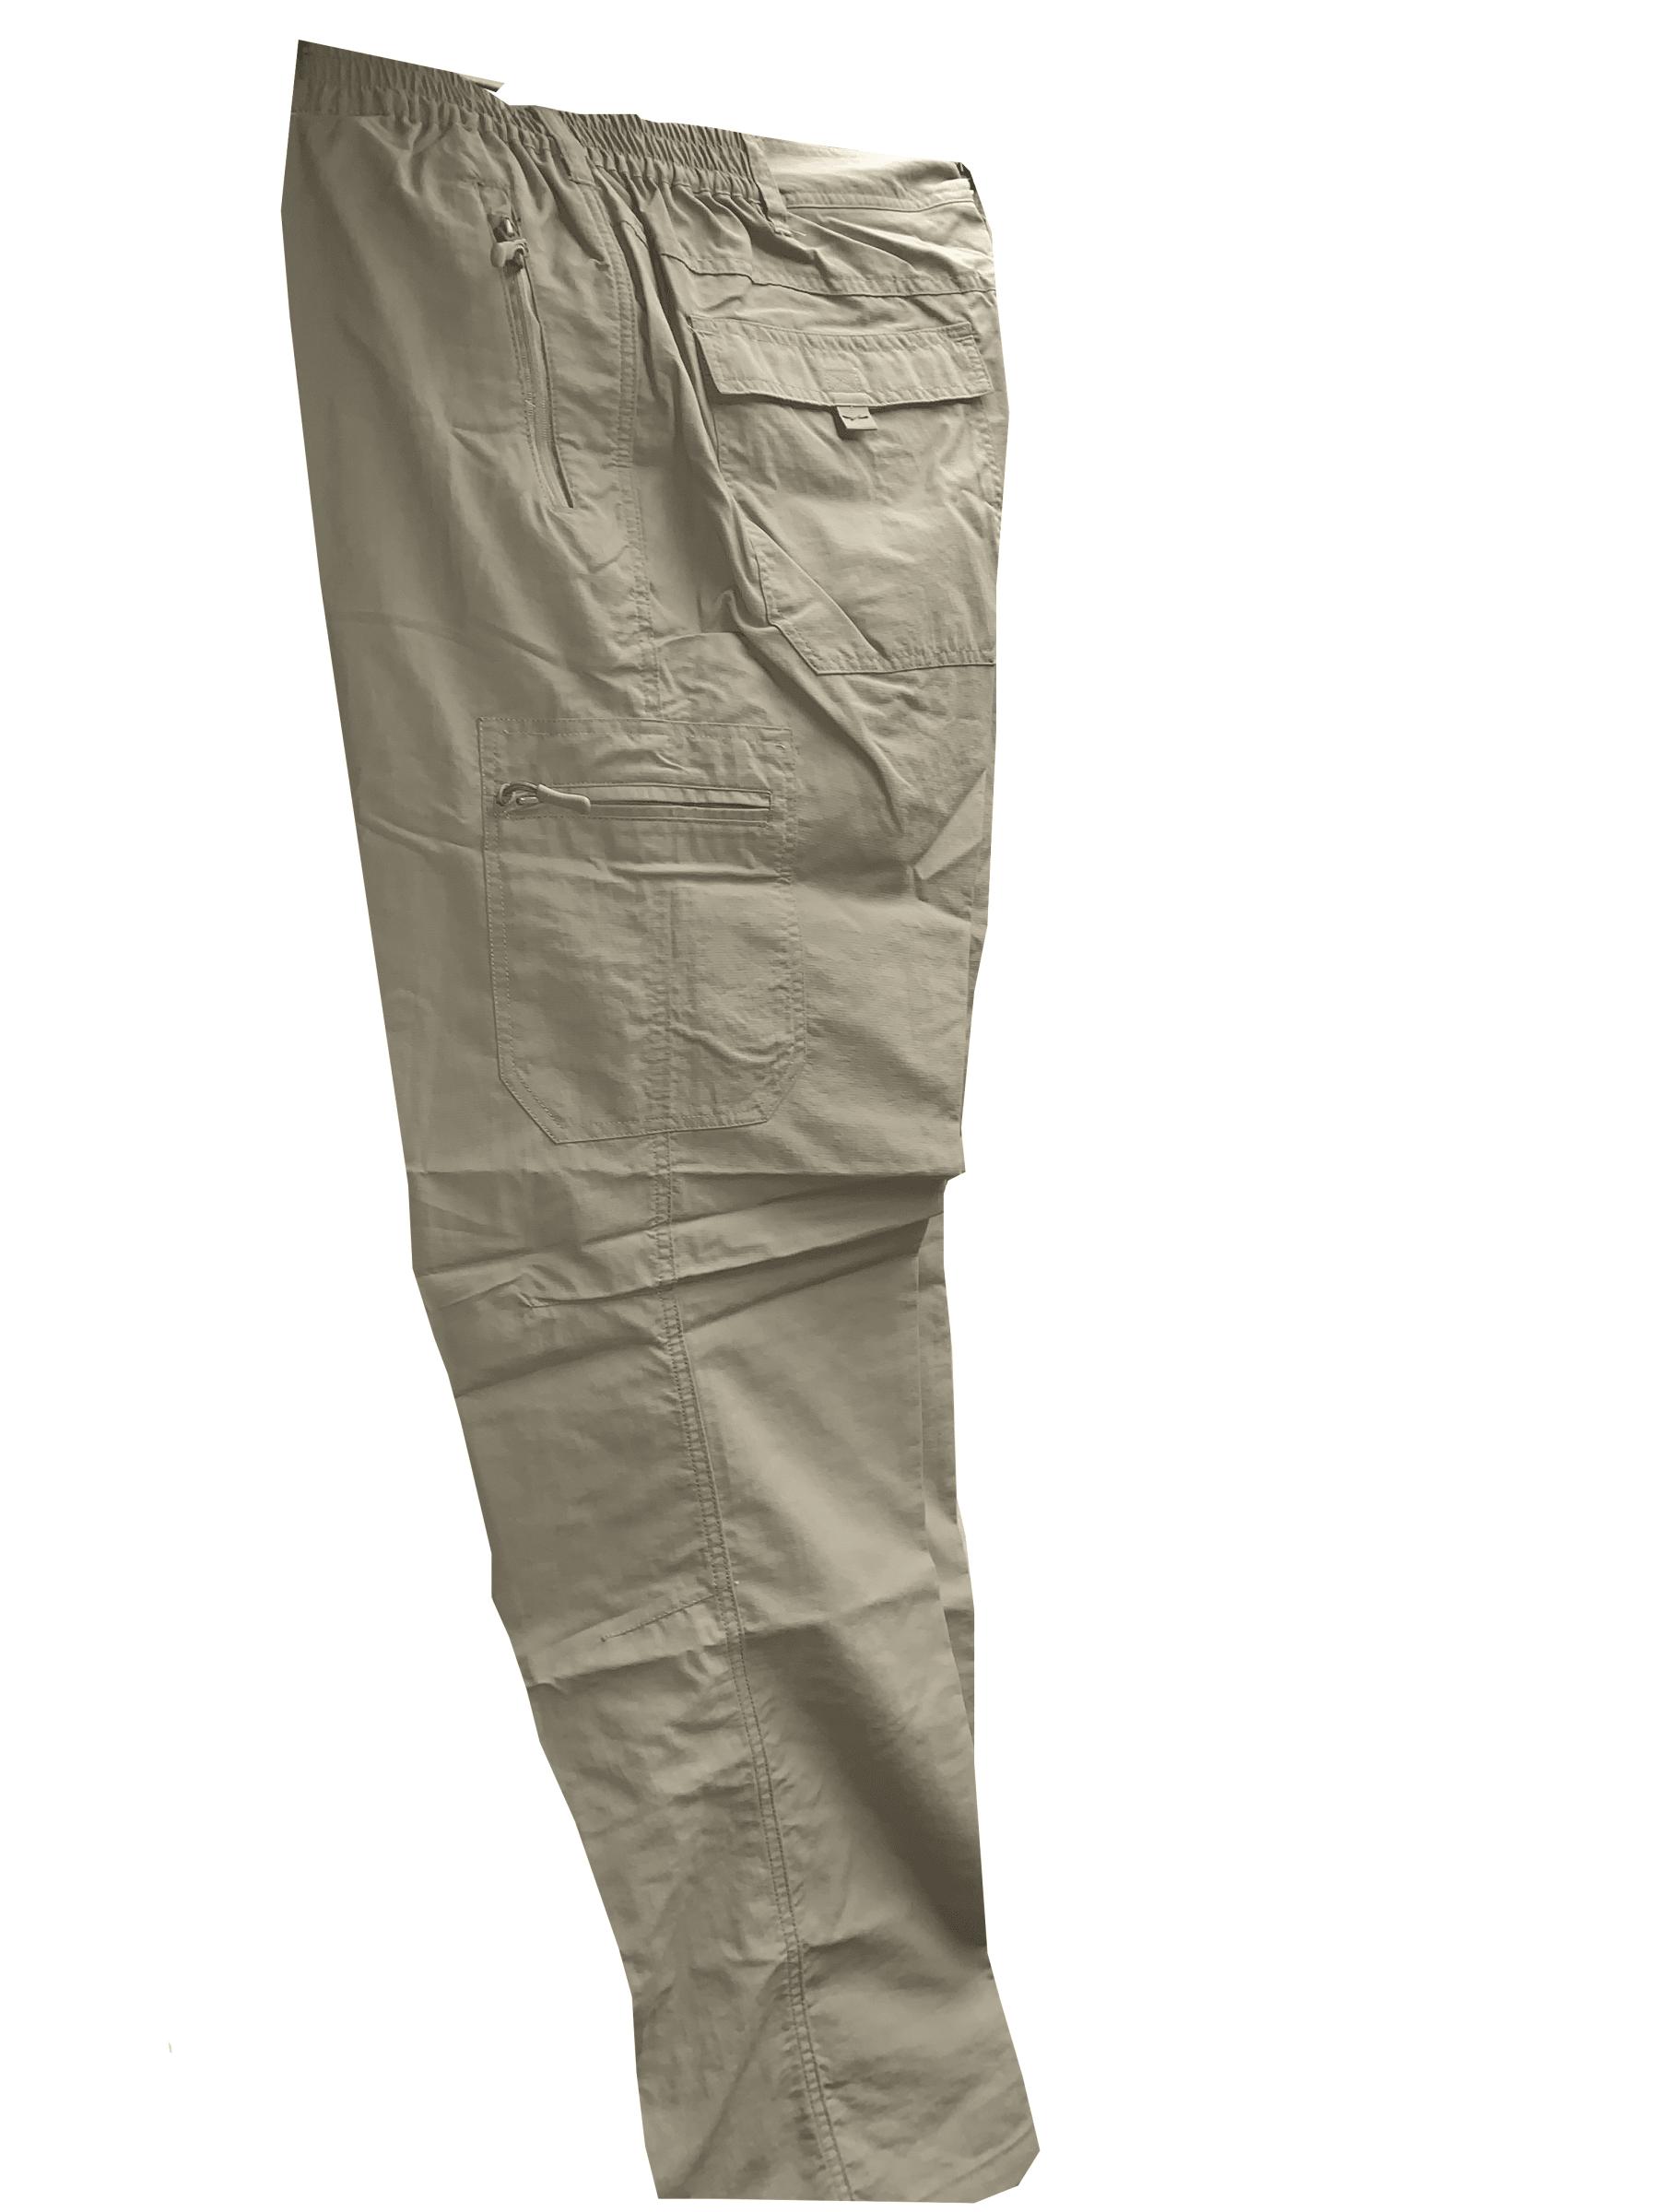 Pantalon Hombre Kanu Outdoor Hombre Beige Oscuro Grunenoutdoor